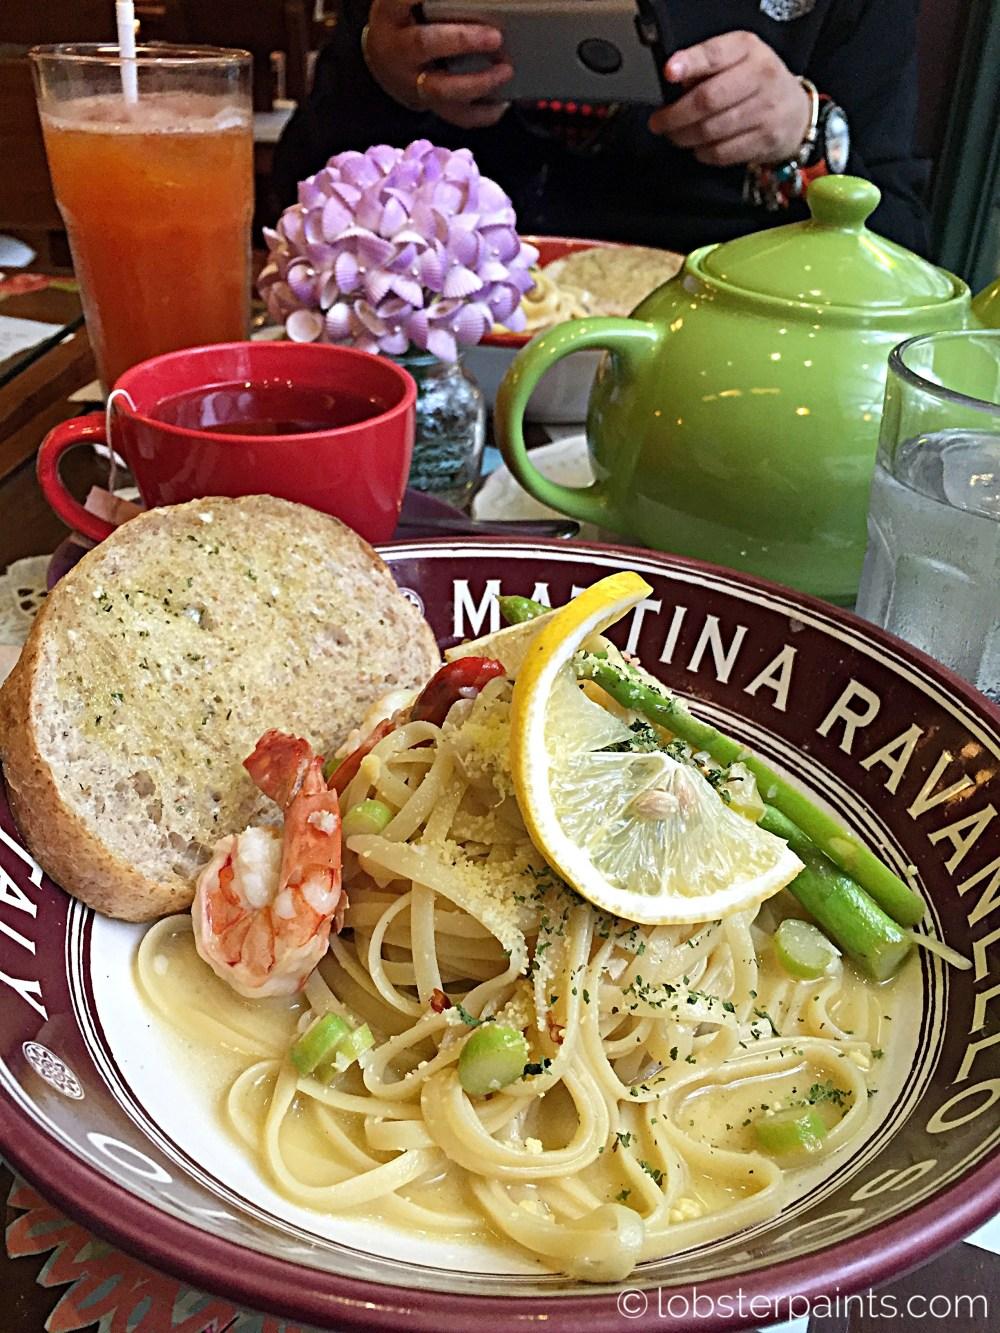 17 October 2015: Mary Grace Cafe @ Serendra | Taguig City, Metro Manila, Philippines